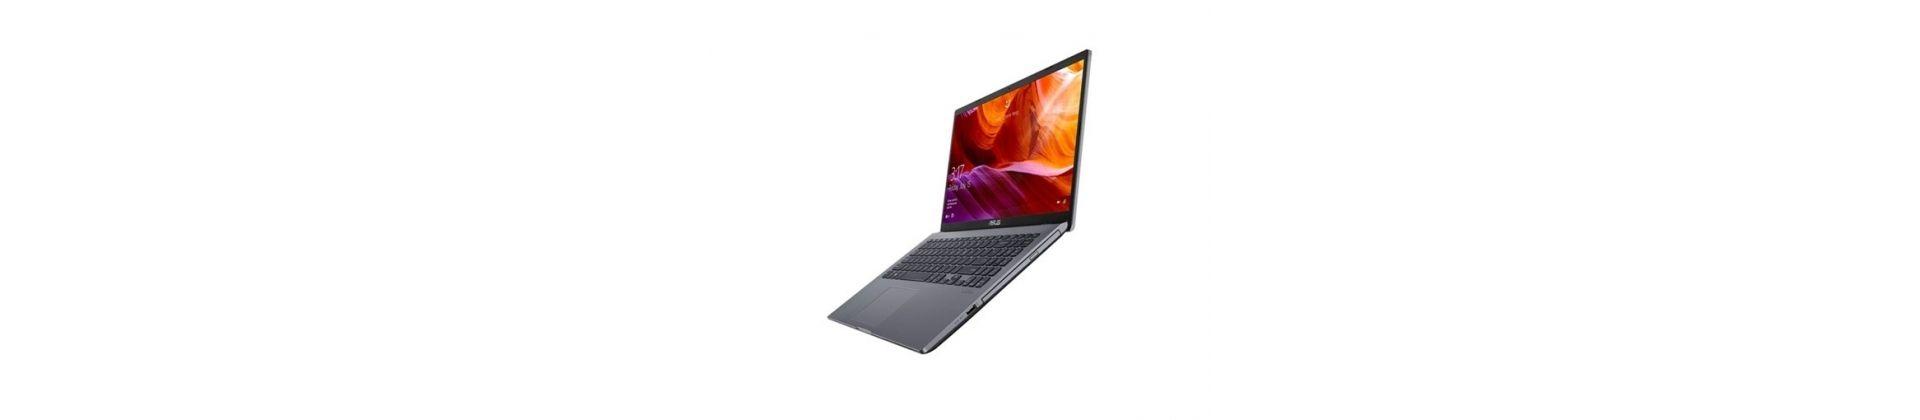 PC portables standards